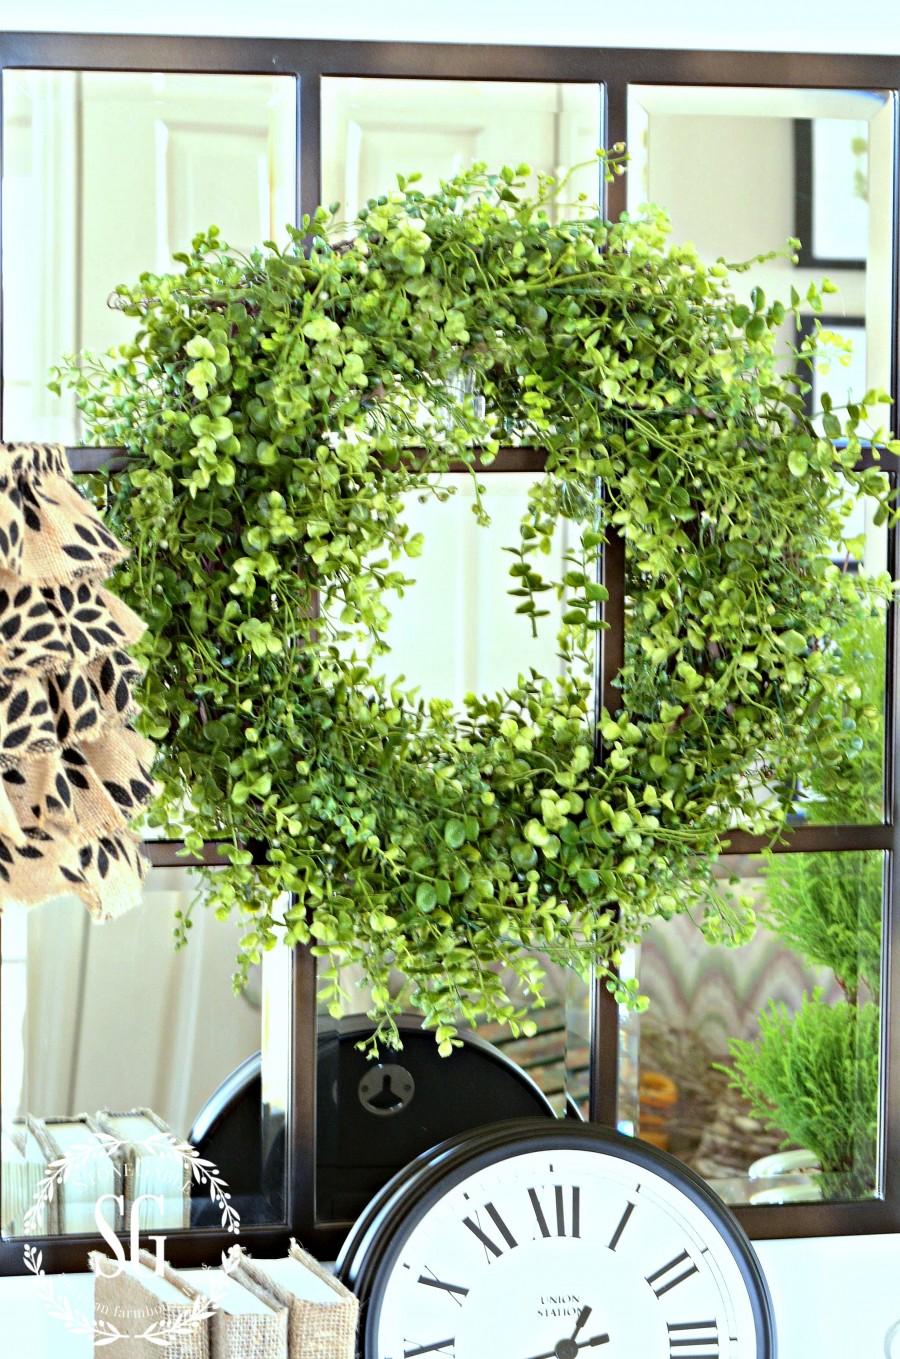 BOXWOOD WREATH IN THE FOYER-wreath in foyer-stonegableblog.com